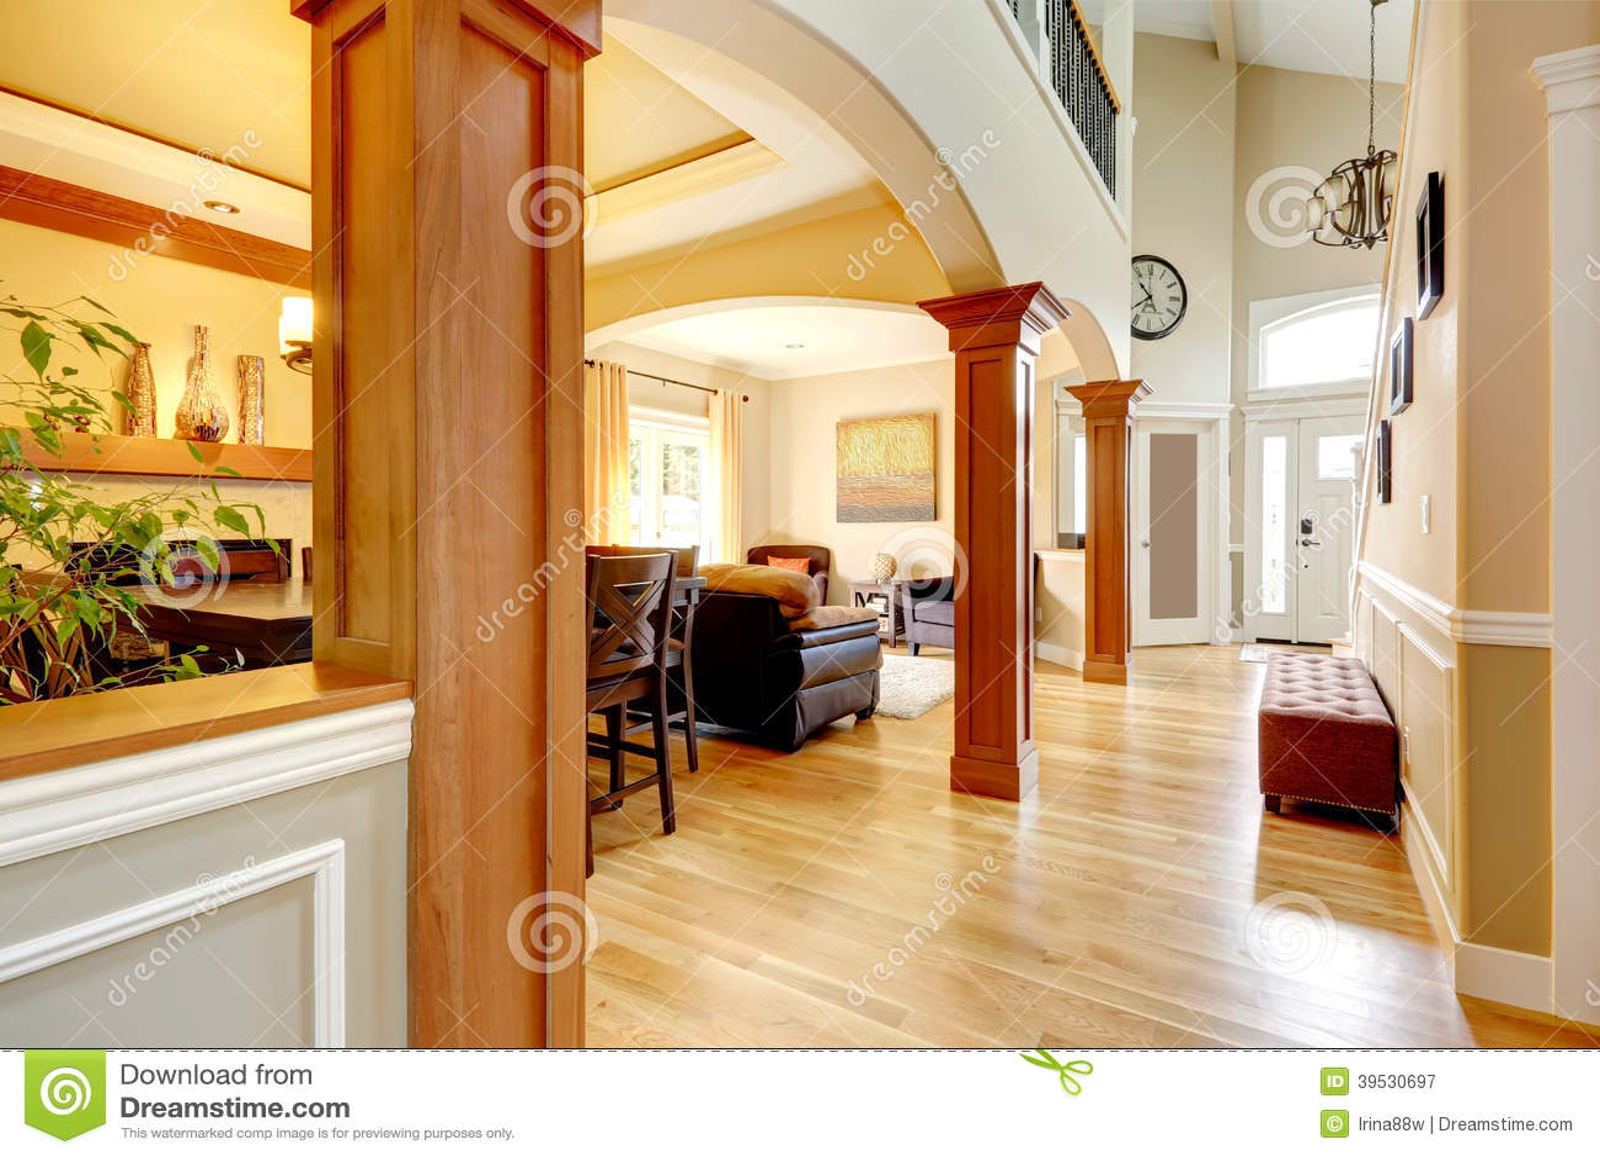 Luxury home interior stock photo image 39530697 - Interior home image ...